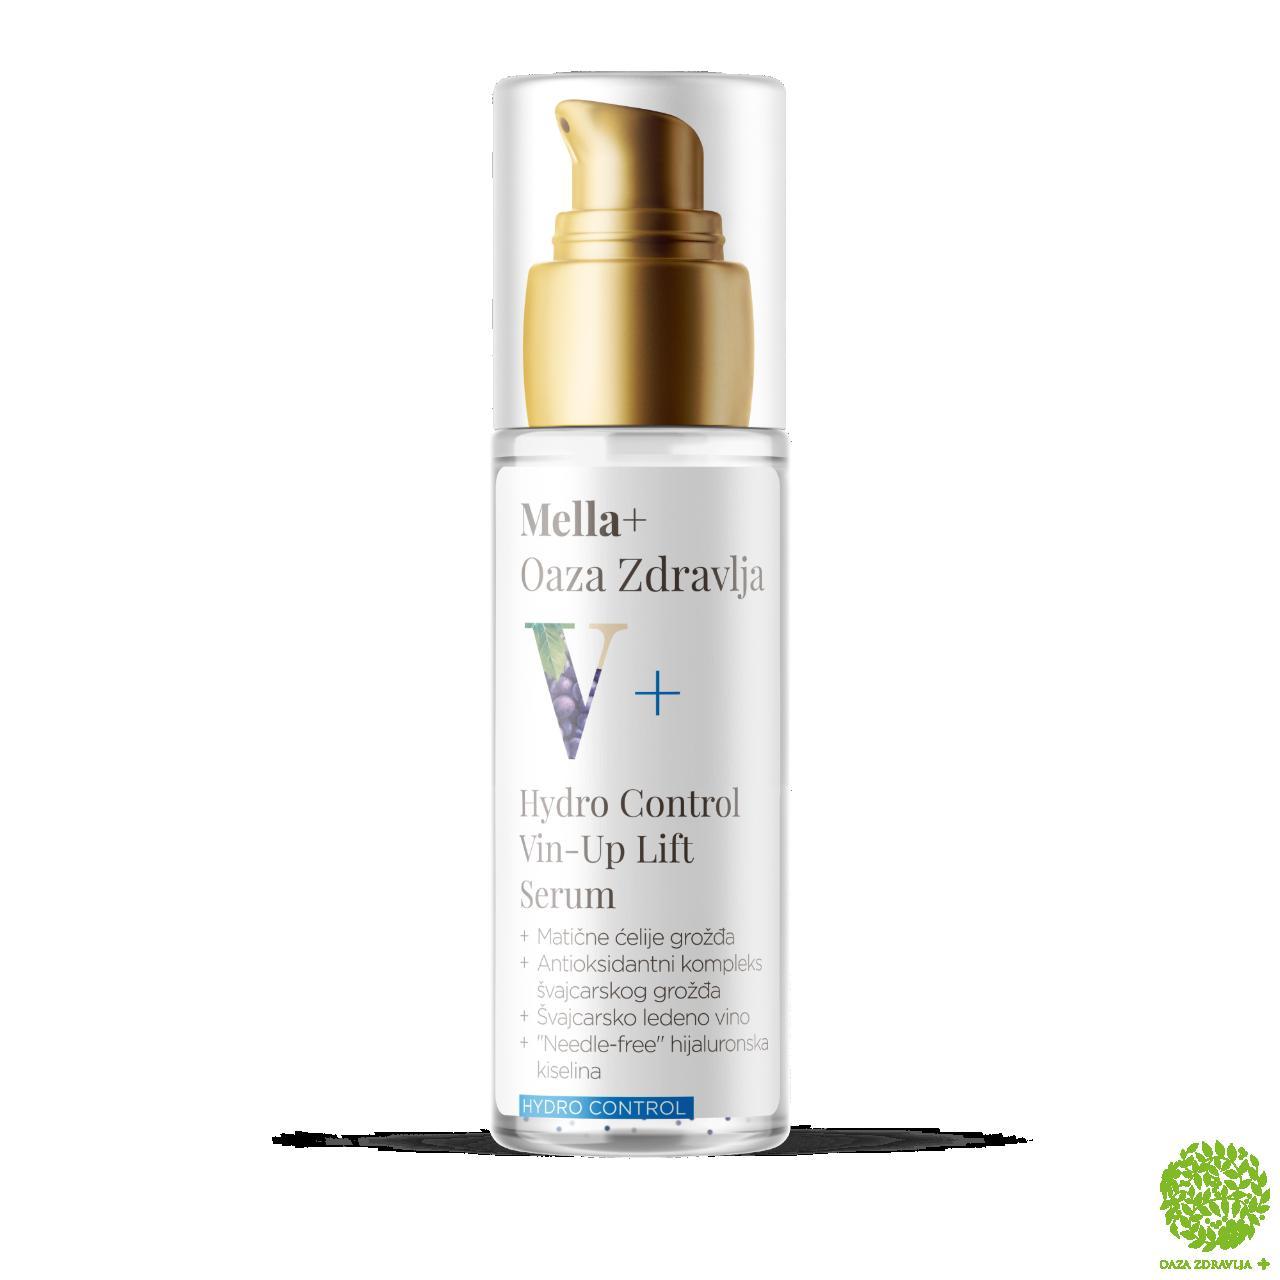 MELLA+ HYDRO CONTROL VIN-UP LIFT SERUM 30ml